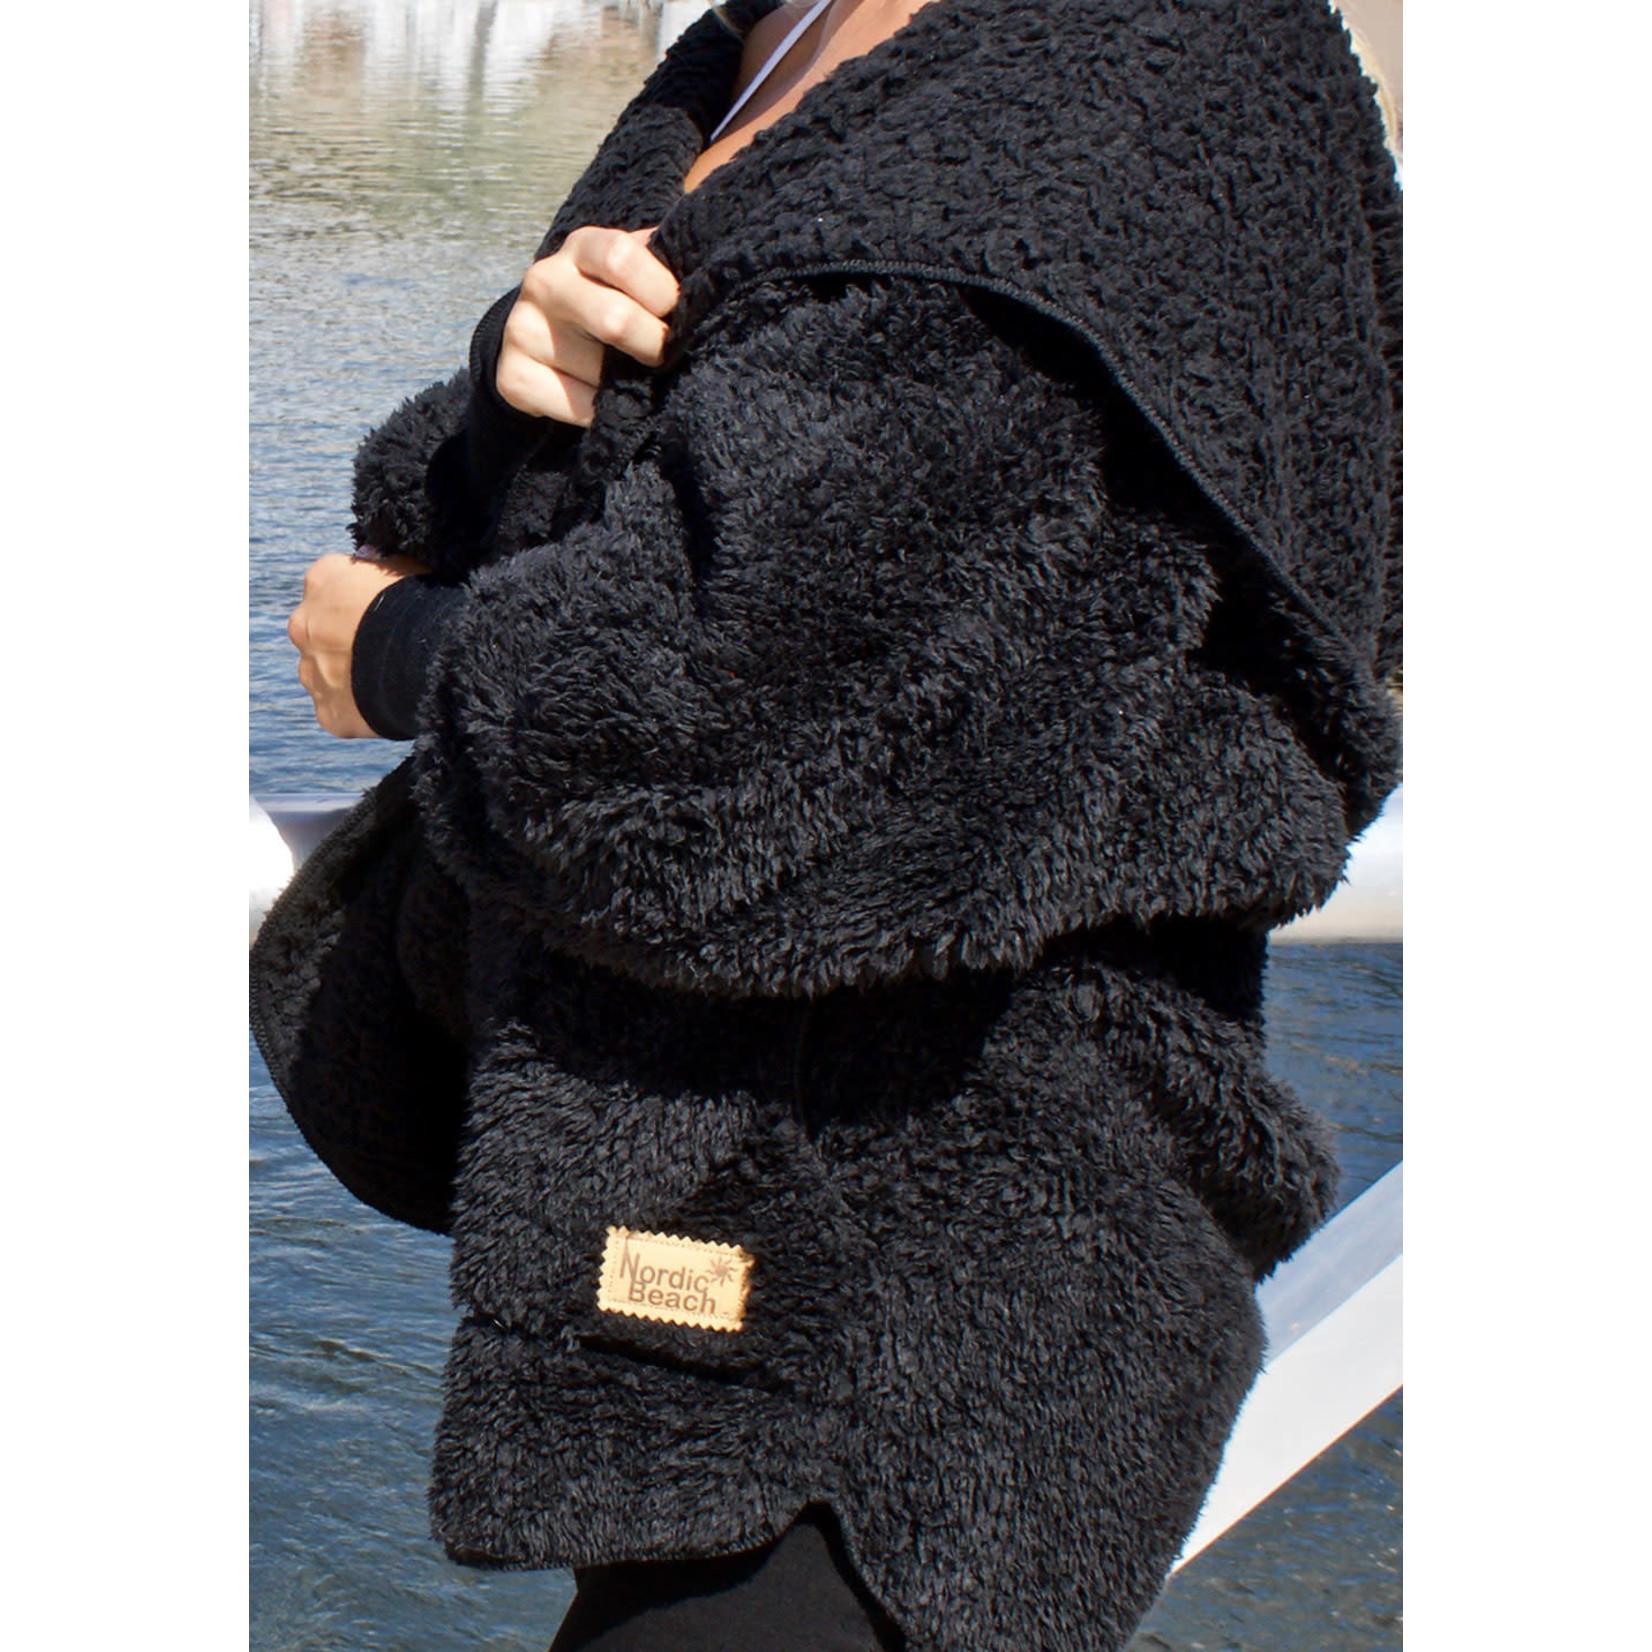 Nordic Beach Fuzzy Fleece Hooded Cardigan in Black Licorice